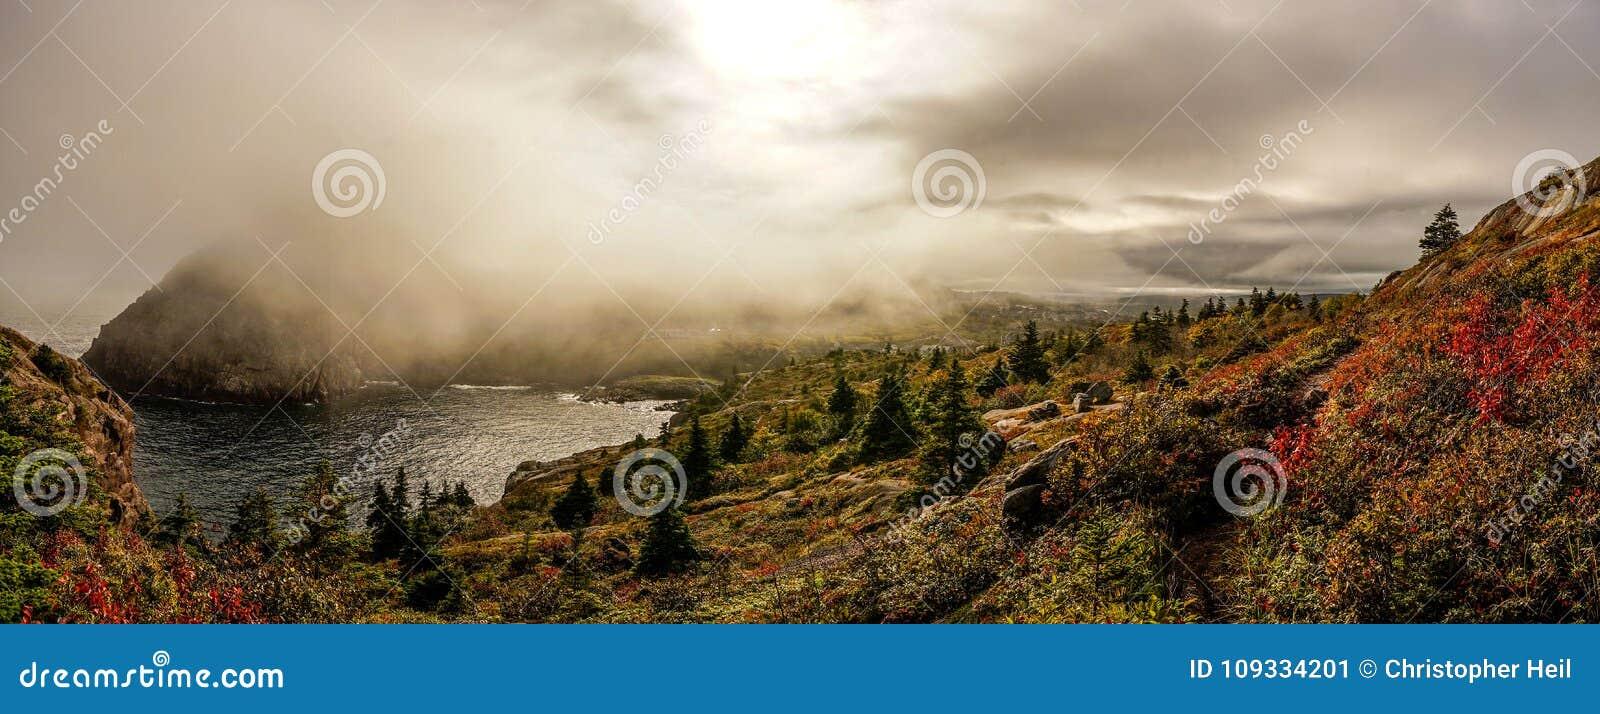 Rastro de la costa este en Terranova, Canadá